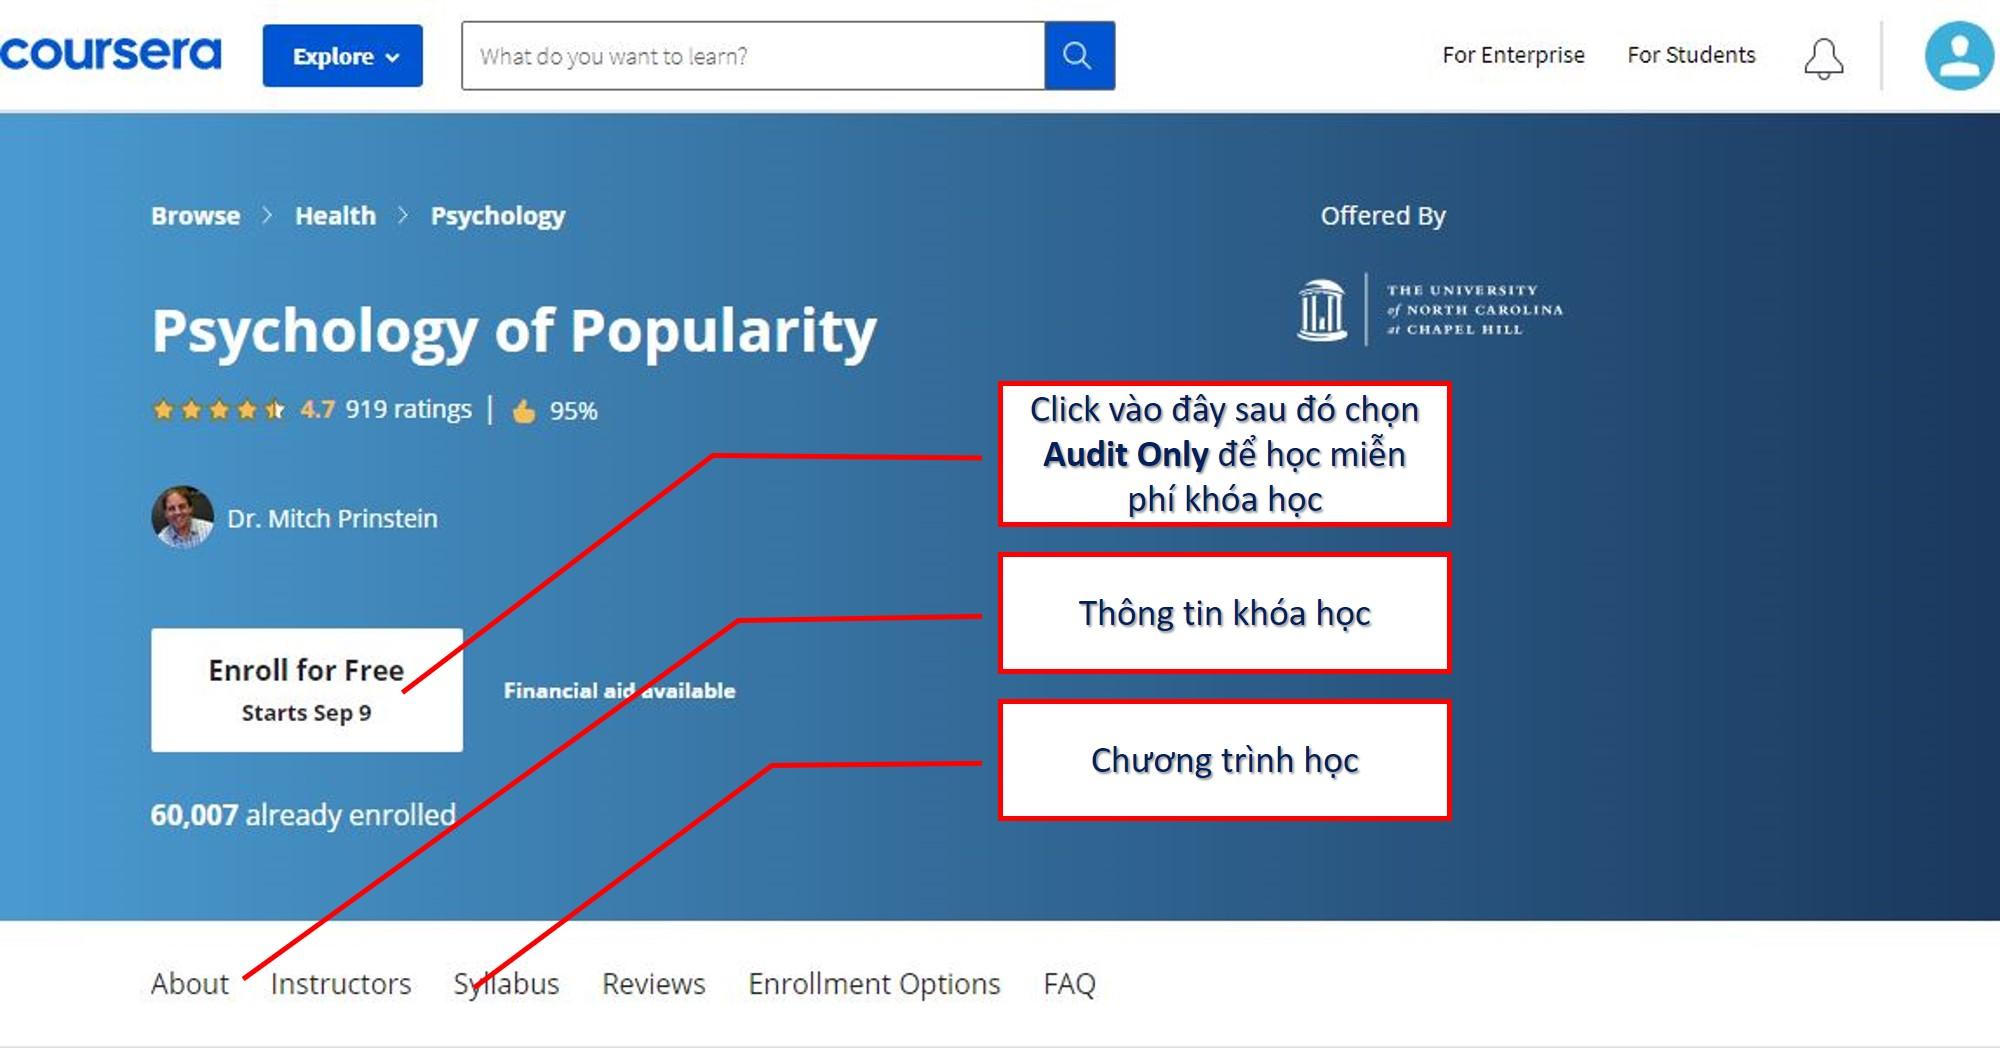 [Coursera] Psychology of Popularity